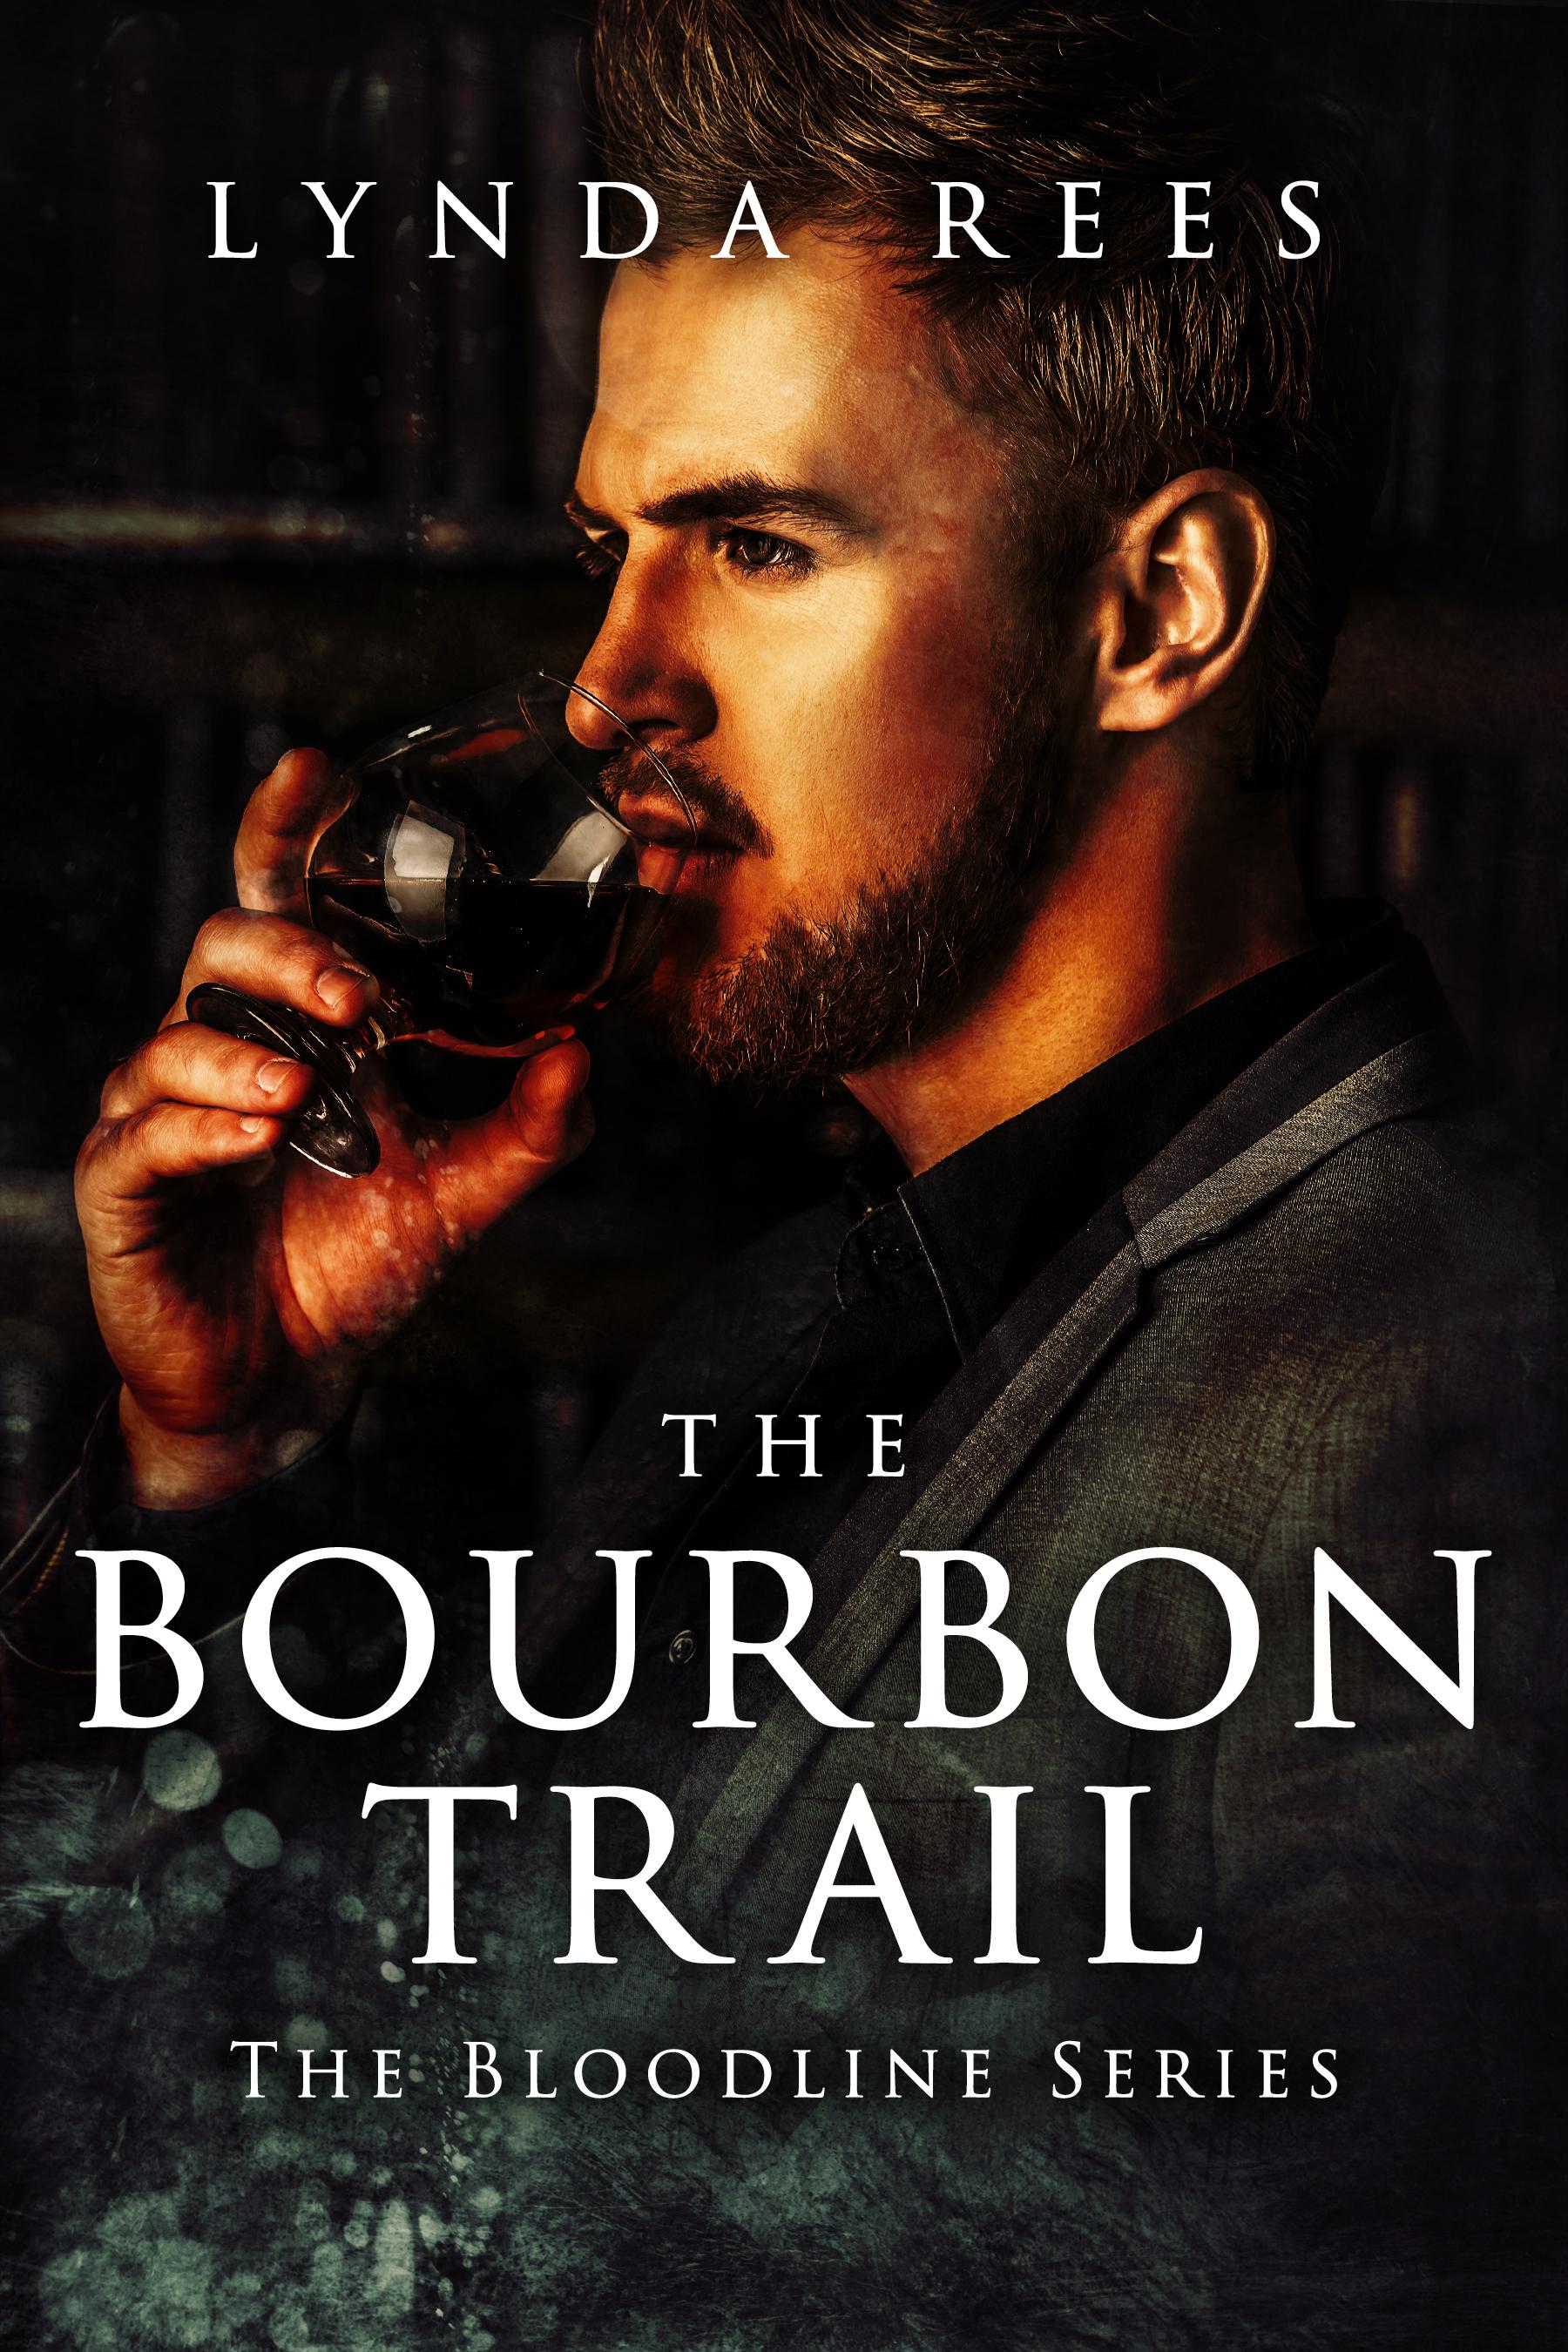 Cover BourbonTrail 050218 eBook